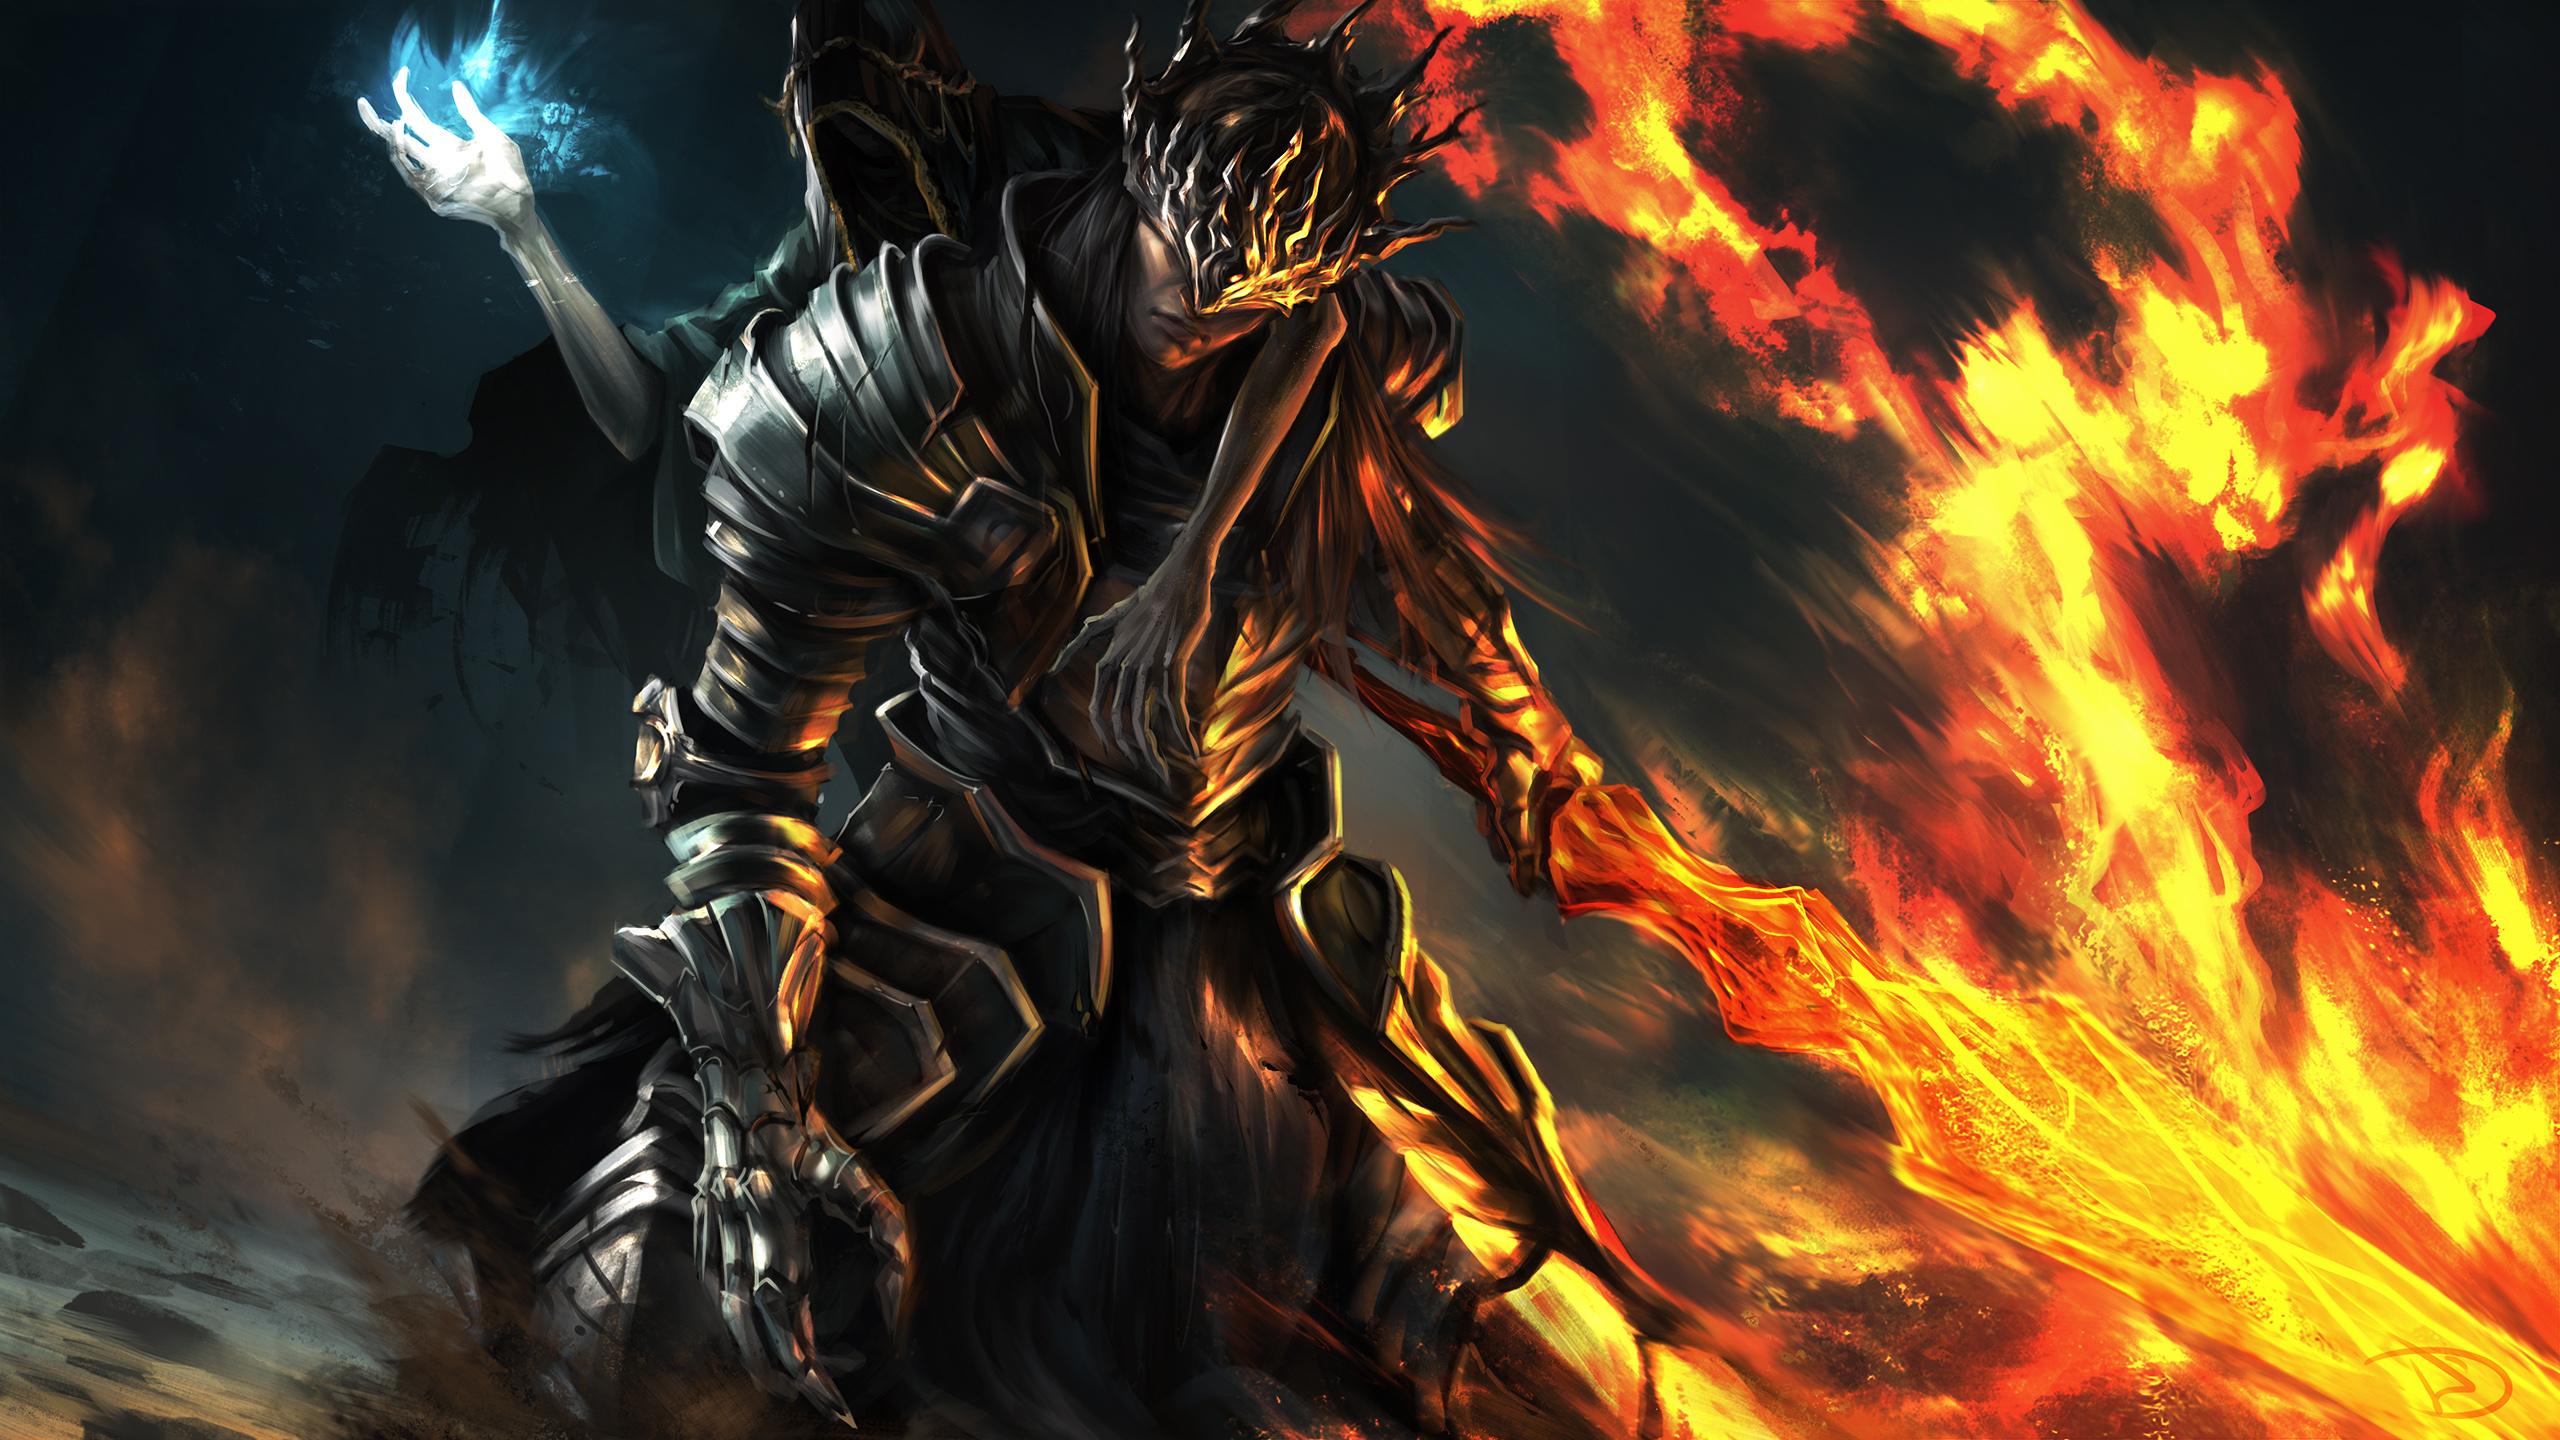 Stupendous Desktop Wallpapers Dark Souls Armor Swords Warriors Fan Interior Design Ideas Grebswwsoteloinfo